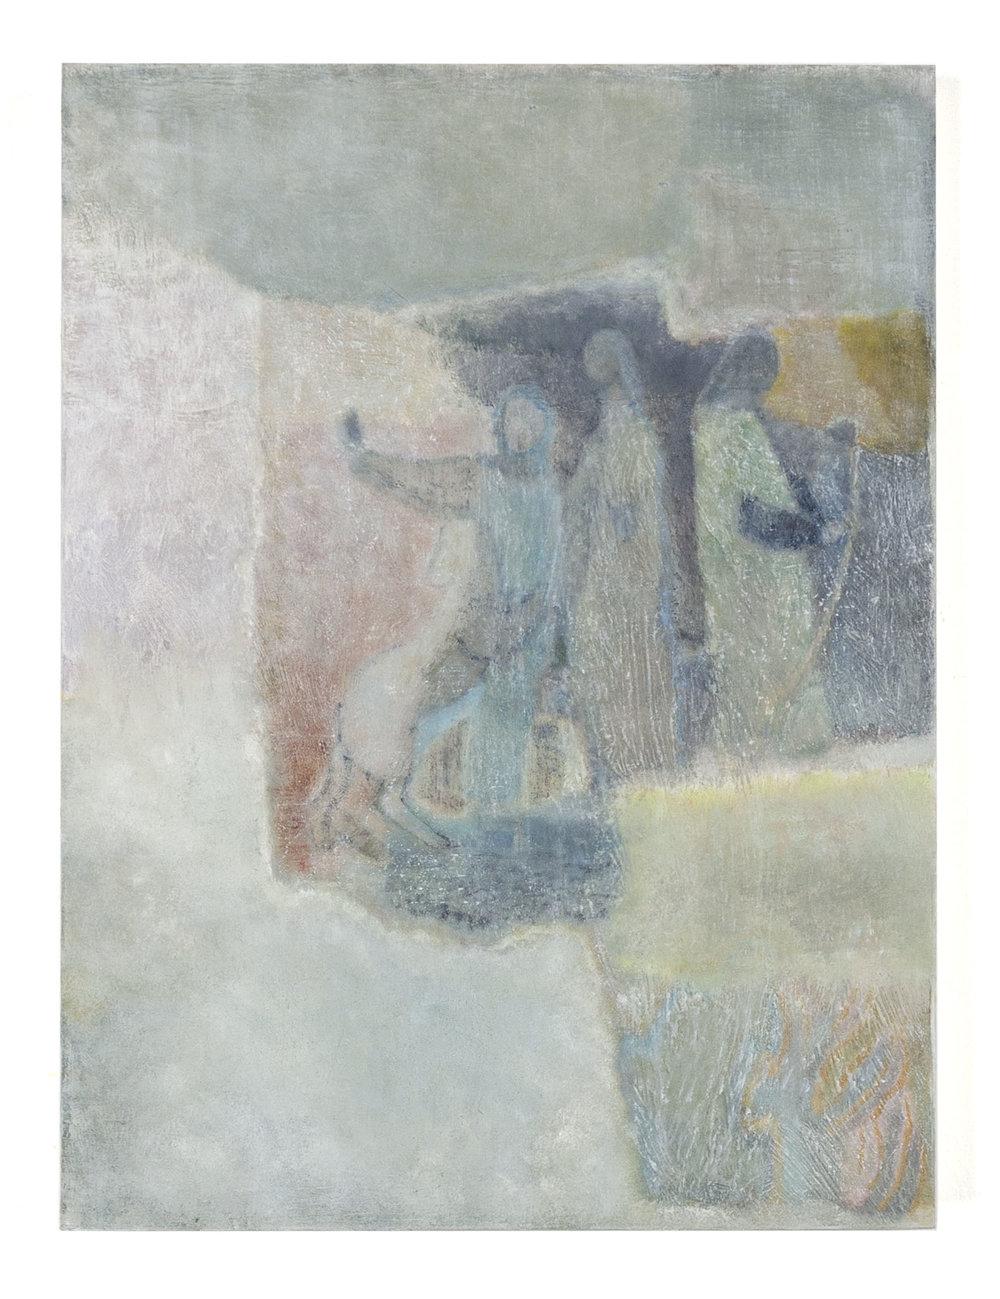 "Excursion,  2018, oil on panel, 16"" x 12"" (41 x30.5 cm)"